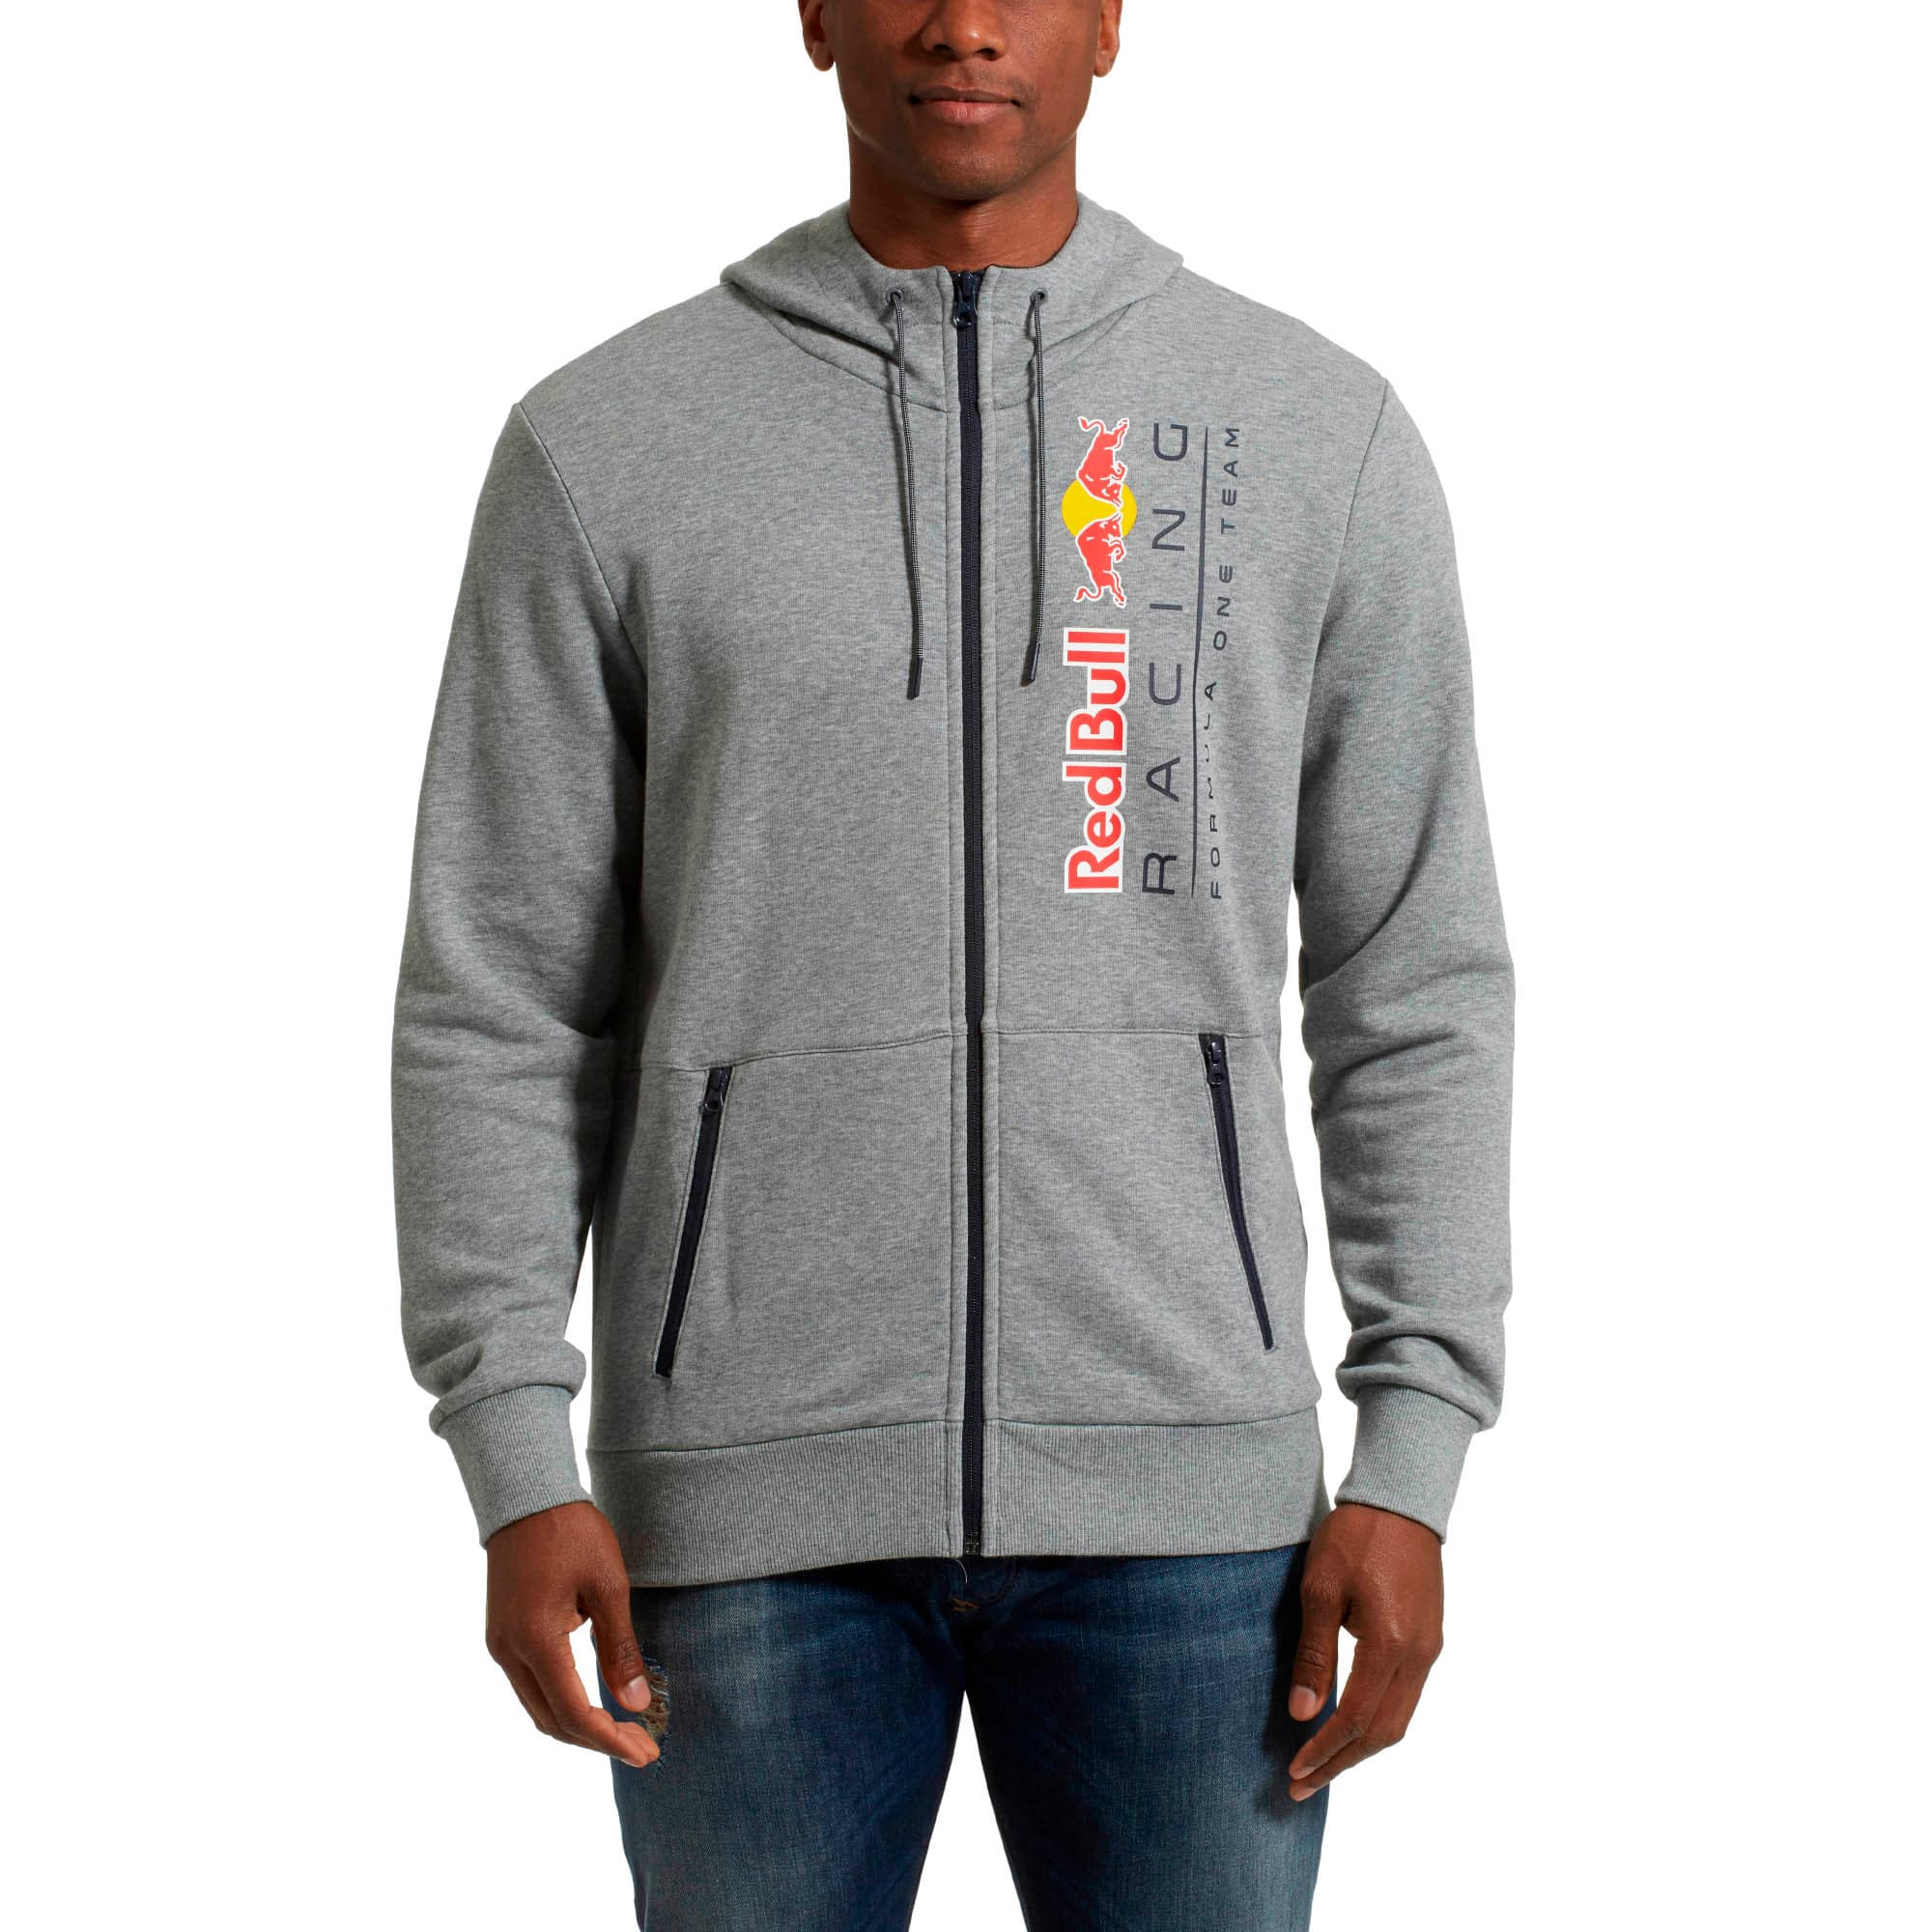 Thumbnail 1 of Red Bull Racing Lifestyle Men's Hooded Sweat Jacket, Medium Gray Heather - 1, medium